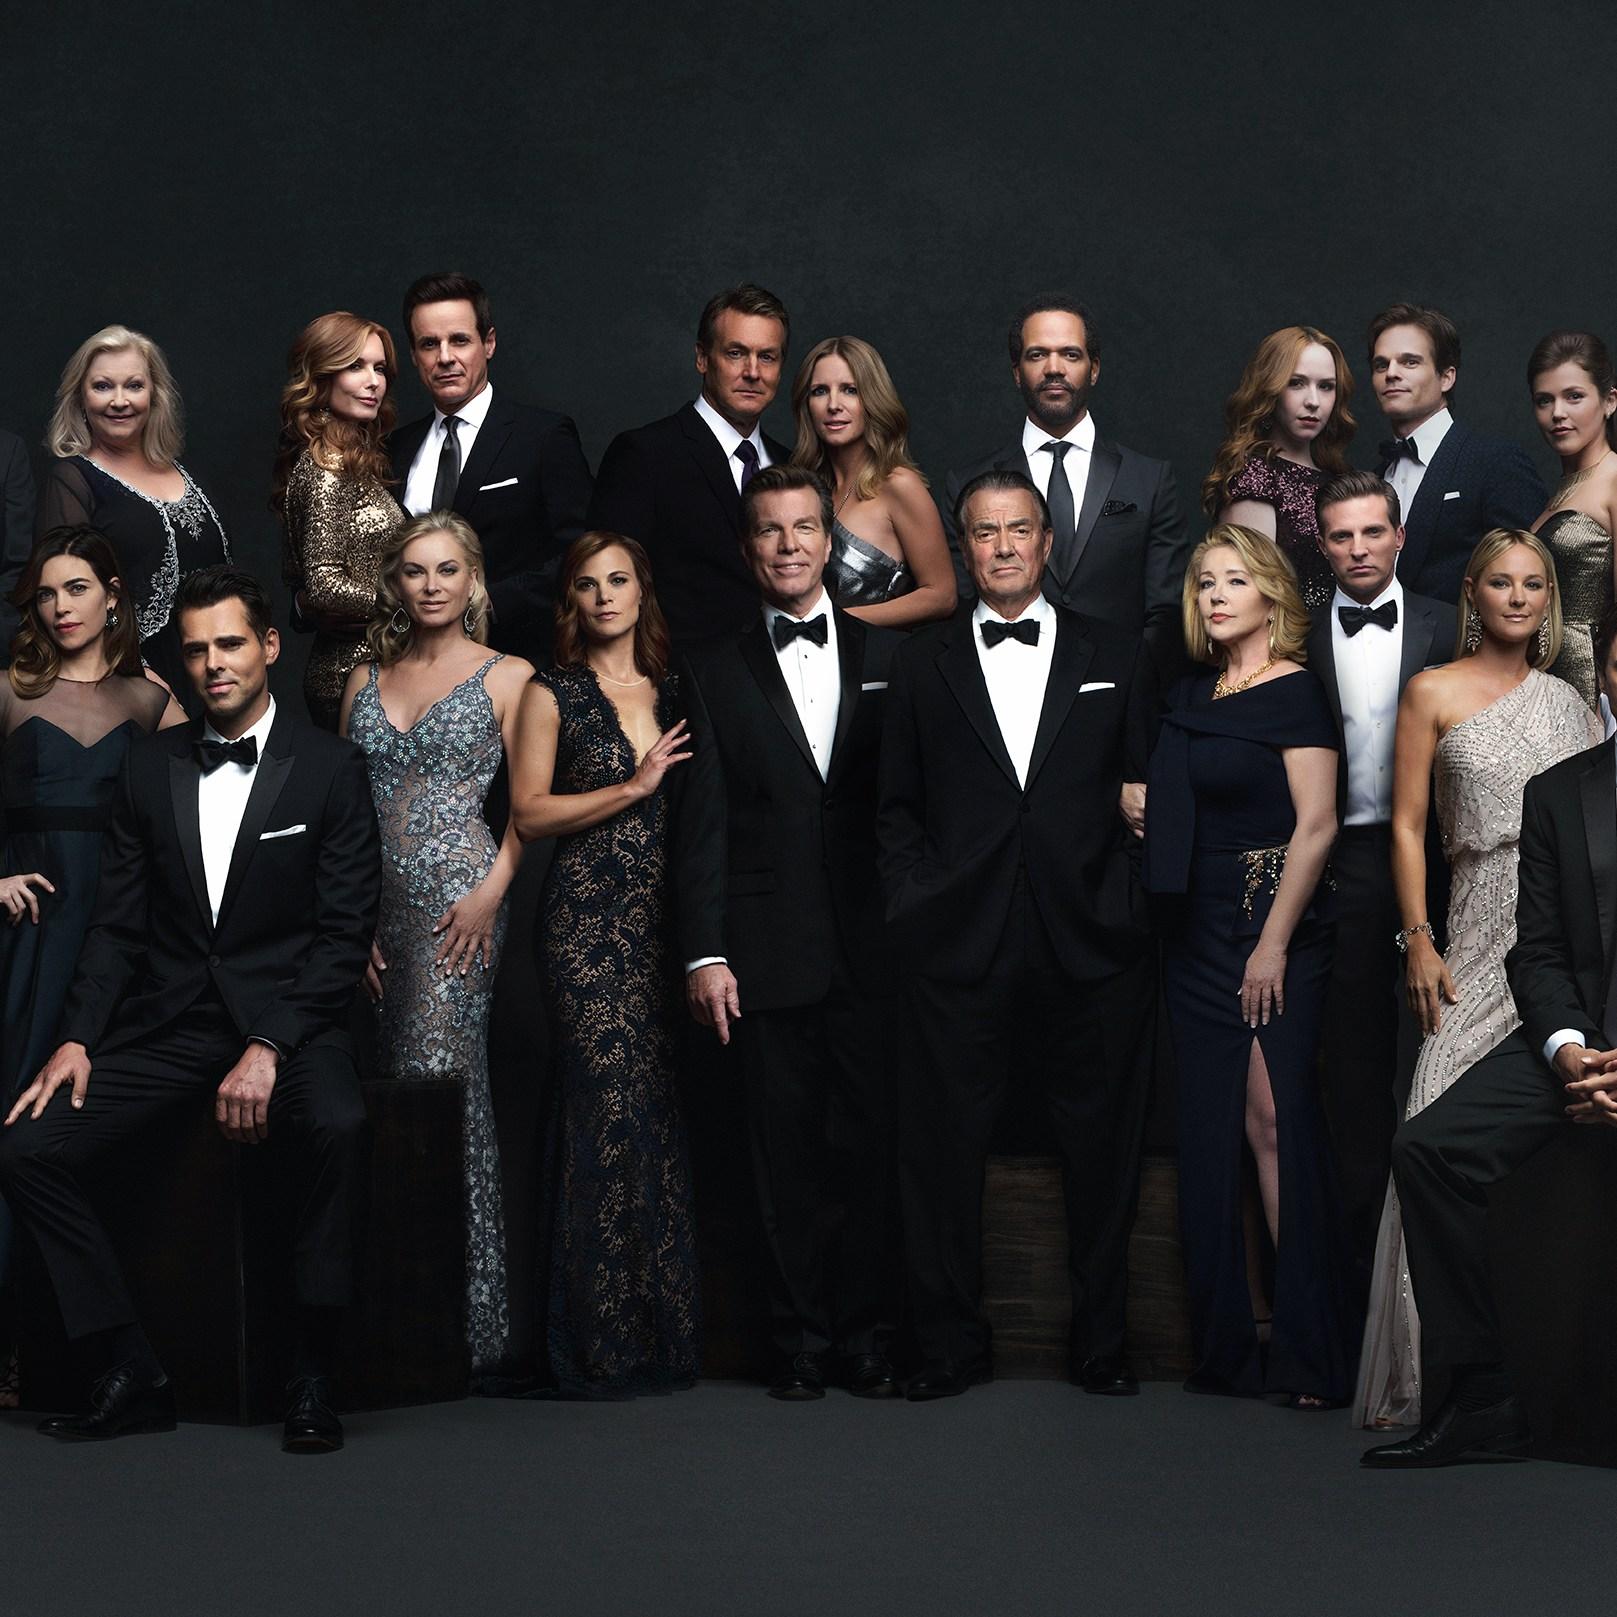 Y&R Cast photo